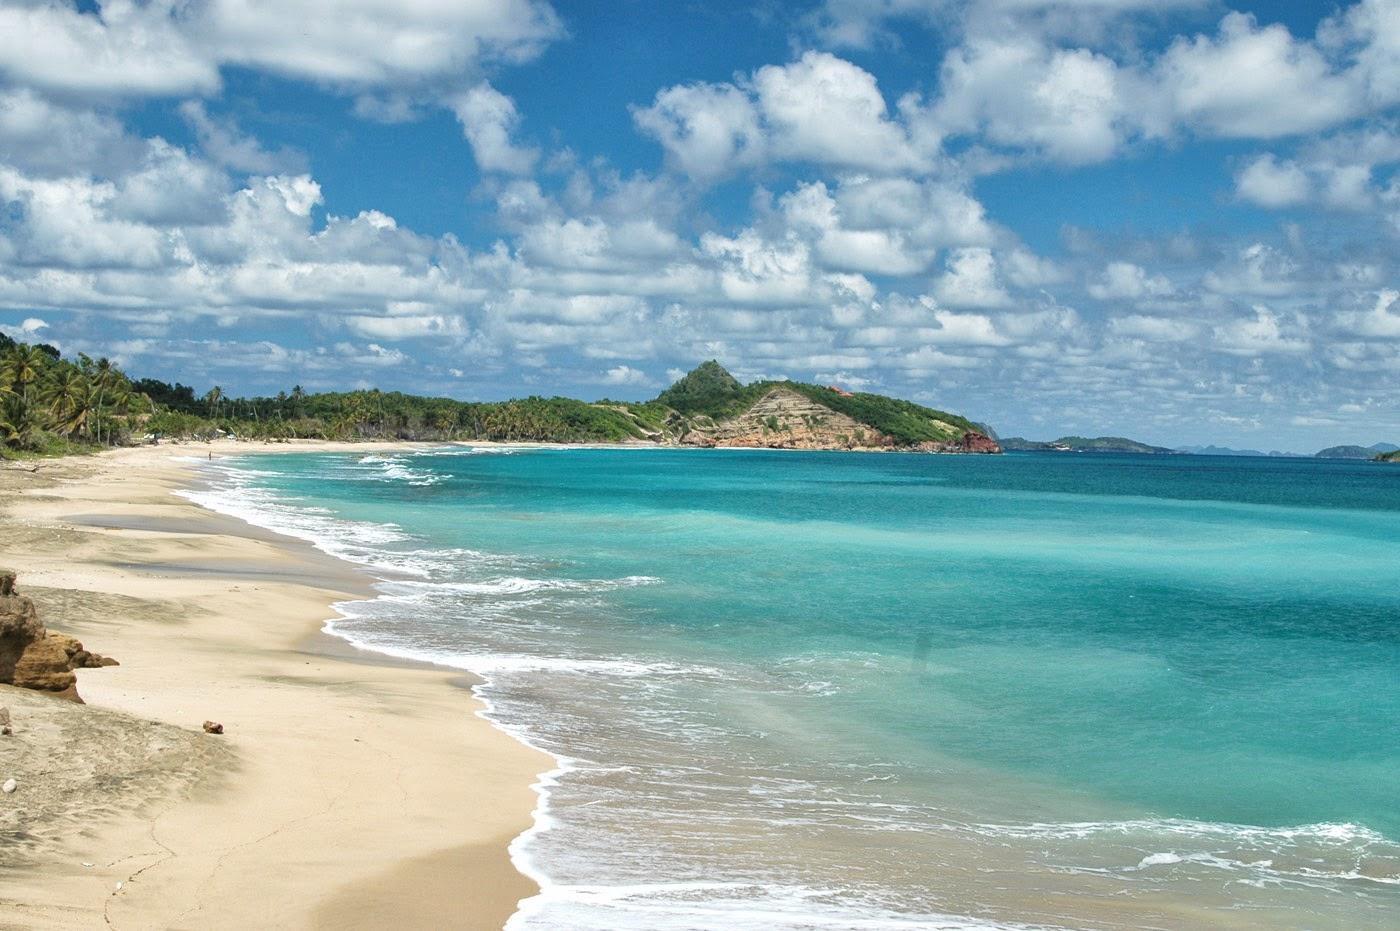 South Caribbean Islands: World Visits: Grenada Island Paradise Island Of Caribbean